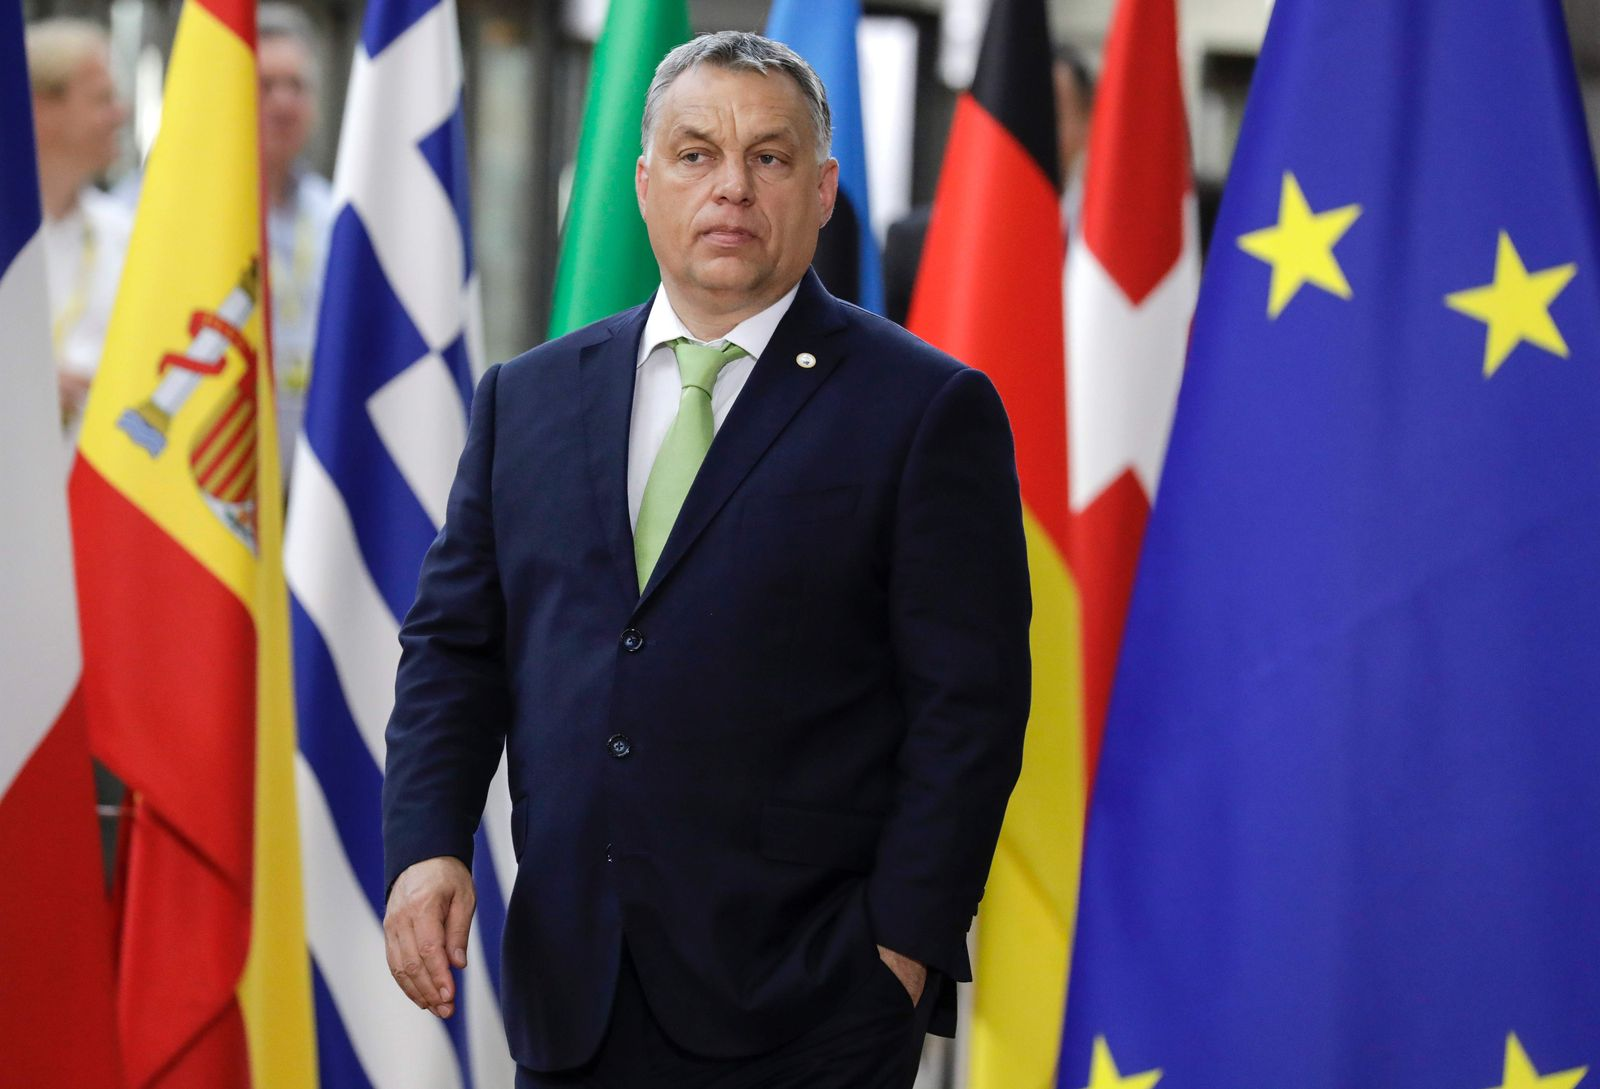 Viktor Orban / Brüssel